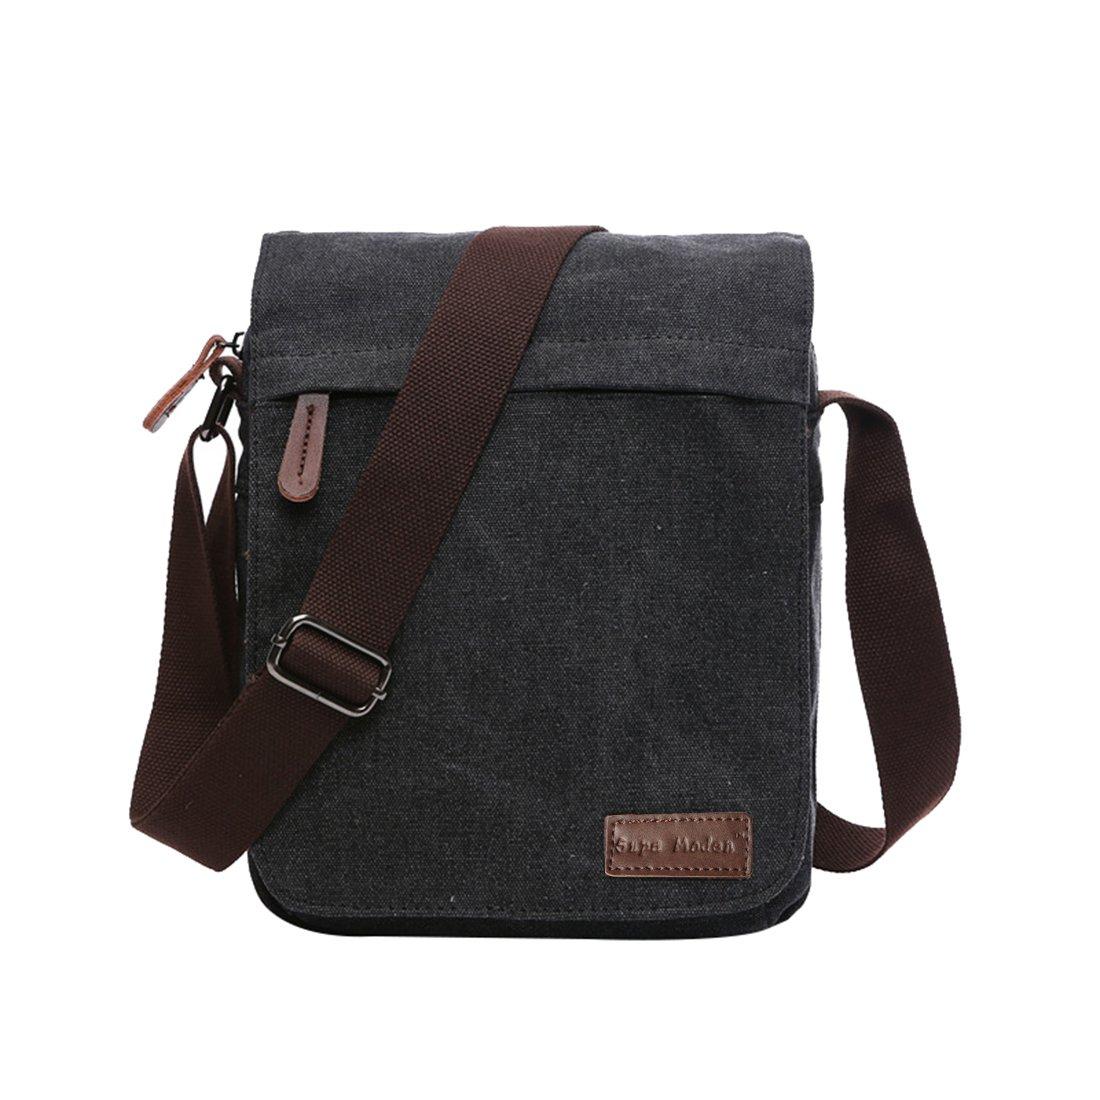 089de1ebe7041 Leinwand Messenger Bag Umhängetasche Laptop Tasche Computer Tasche  Umhängetasche aus Segeltuch Tasche Arbeiten Tasche Umhängetasche für